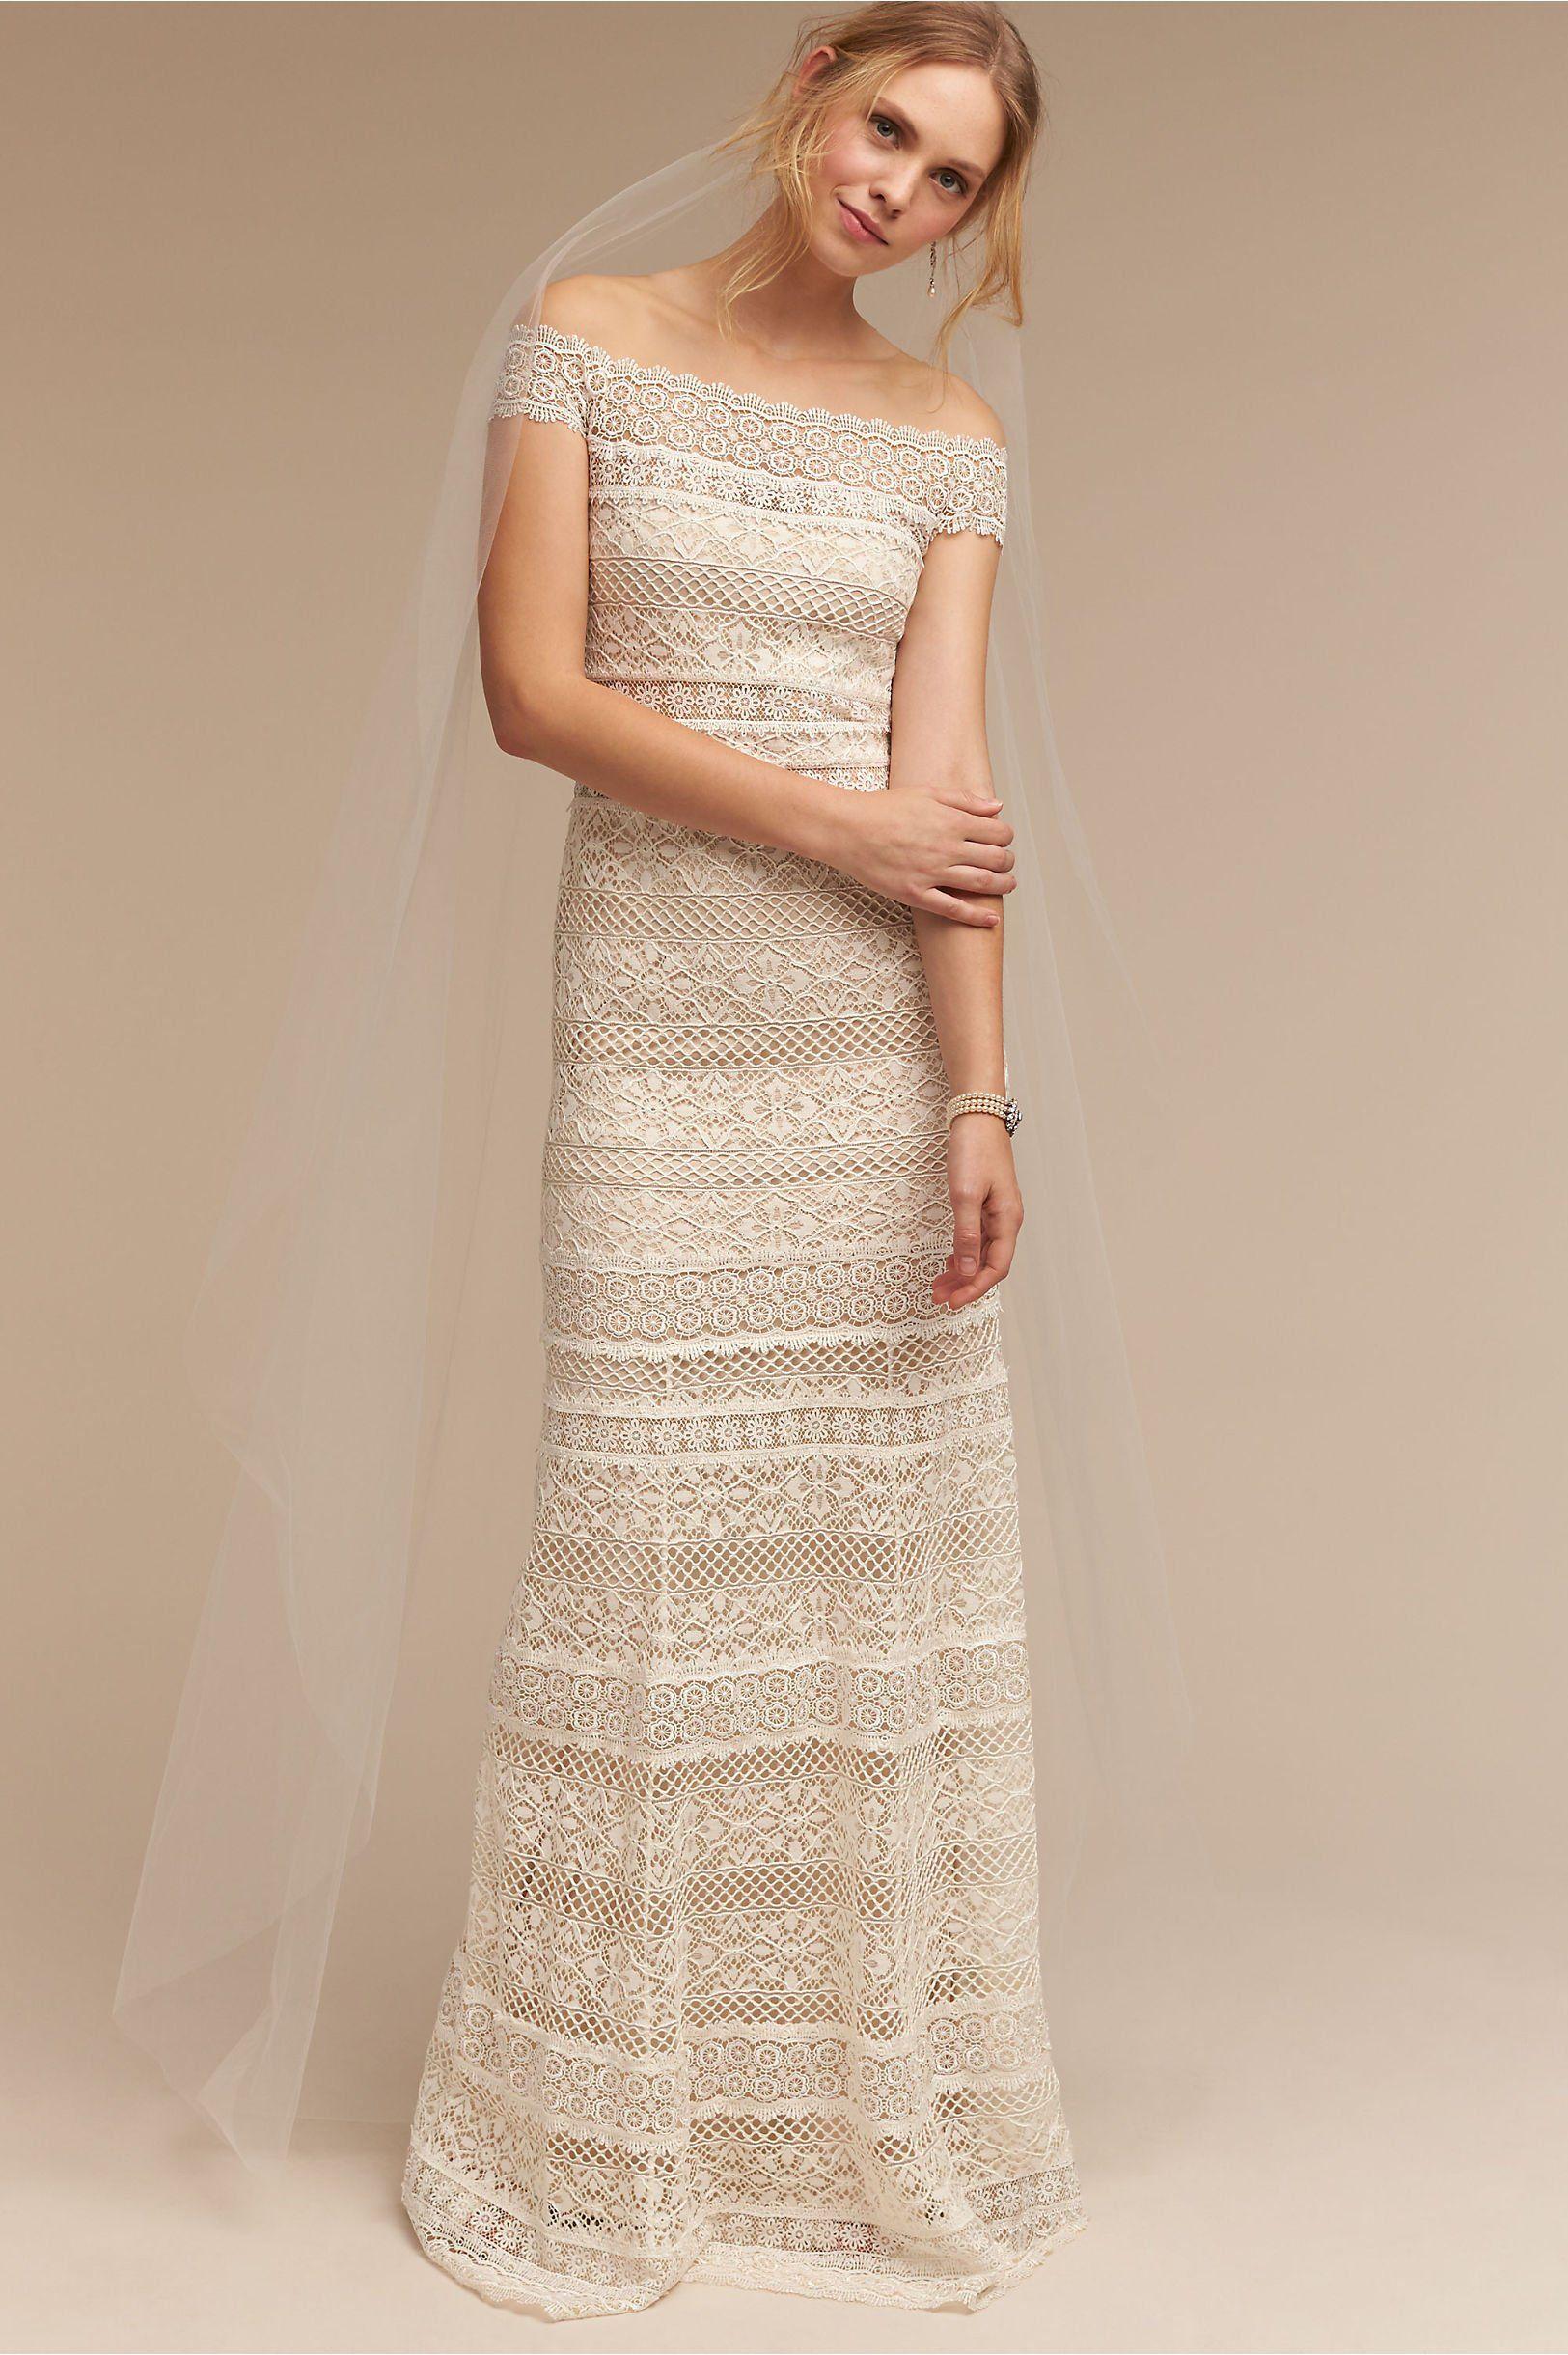 Affordable bohemian wedding dresses  BHLDNus Eira Gown  Affordable wedding dresses Gowns and Wedding dress